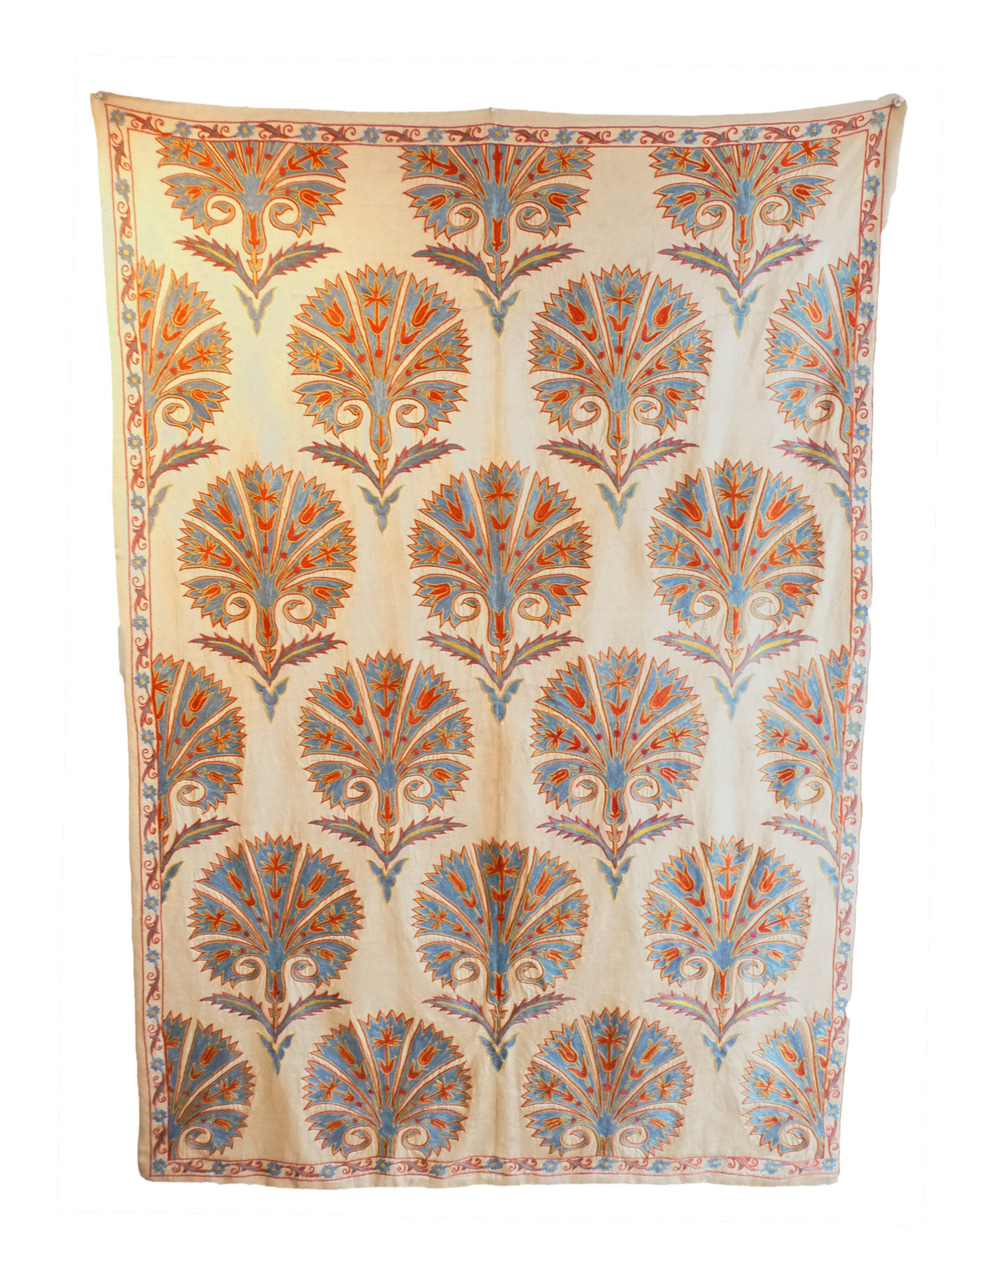 anthony hazledini rugs and textiles, ikat, suzani, leeched, england, central asia, uzbekistan, Afghanistan, Tajikistan